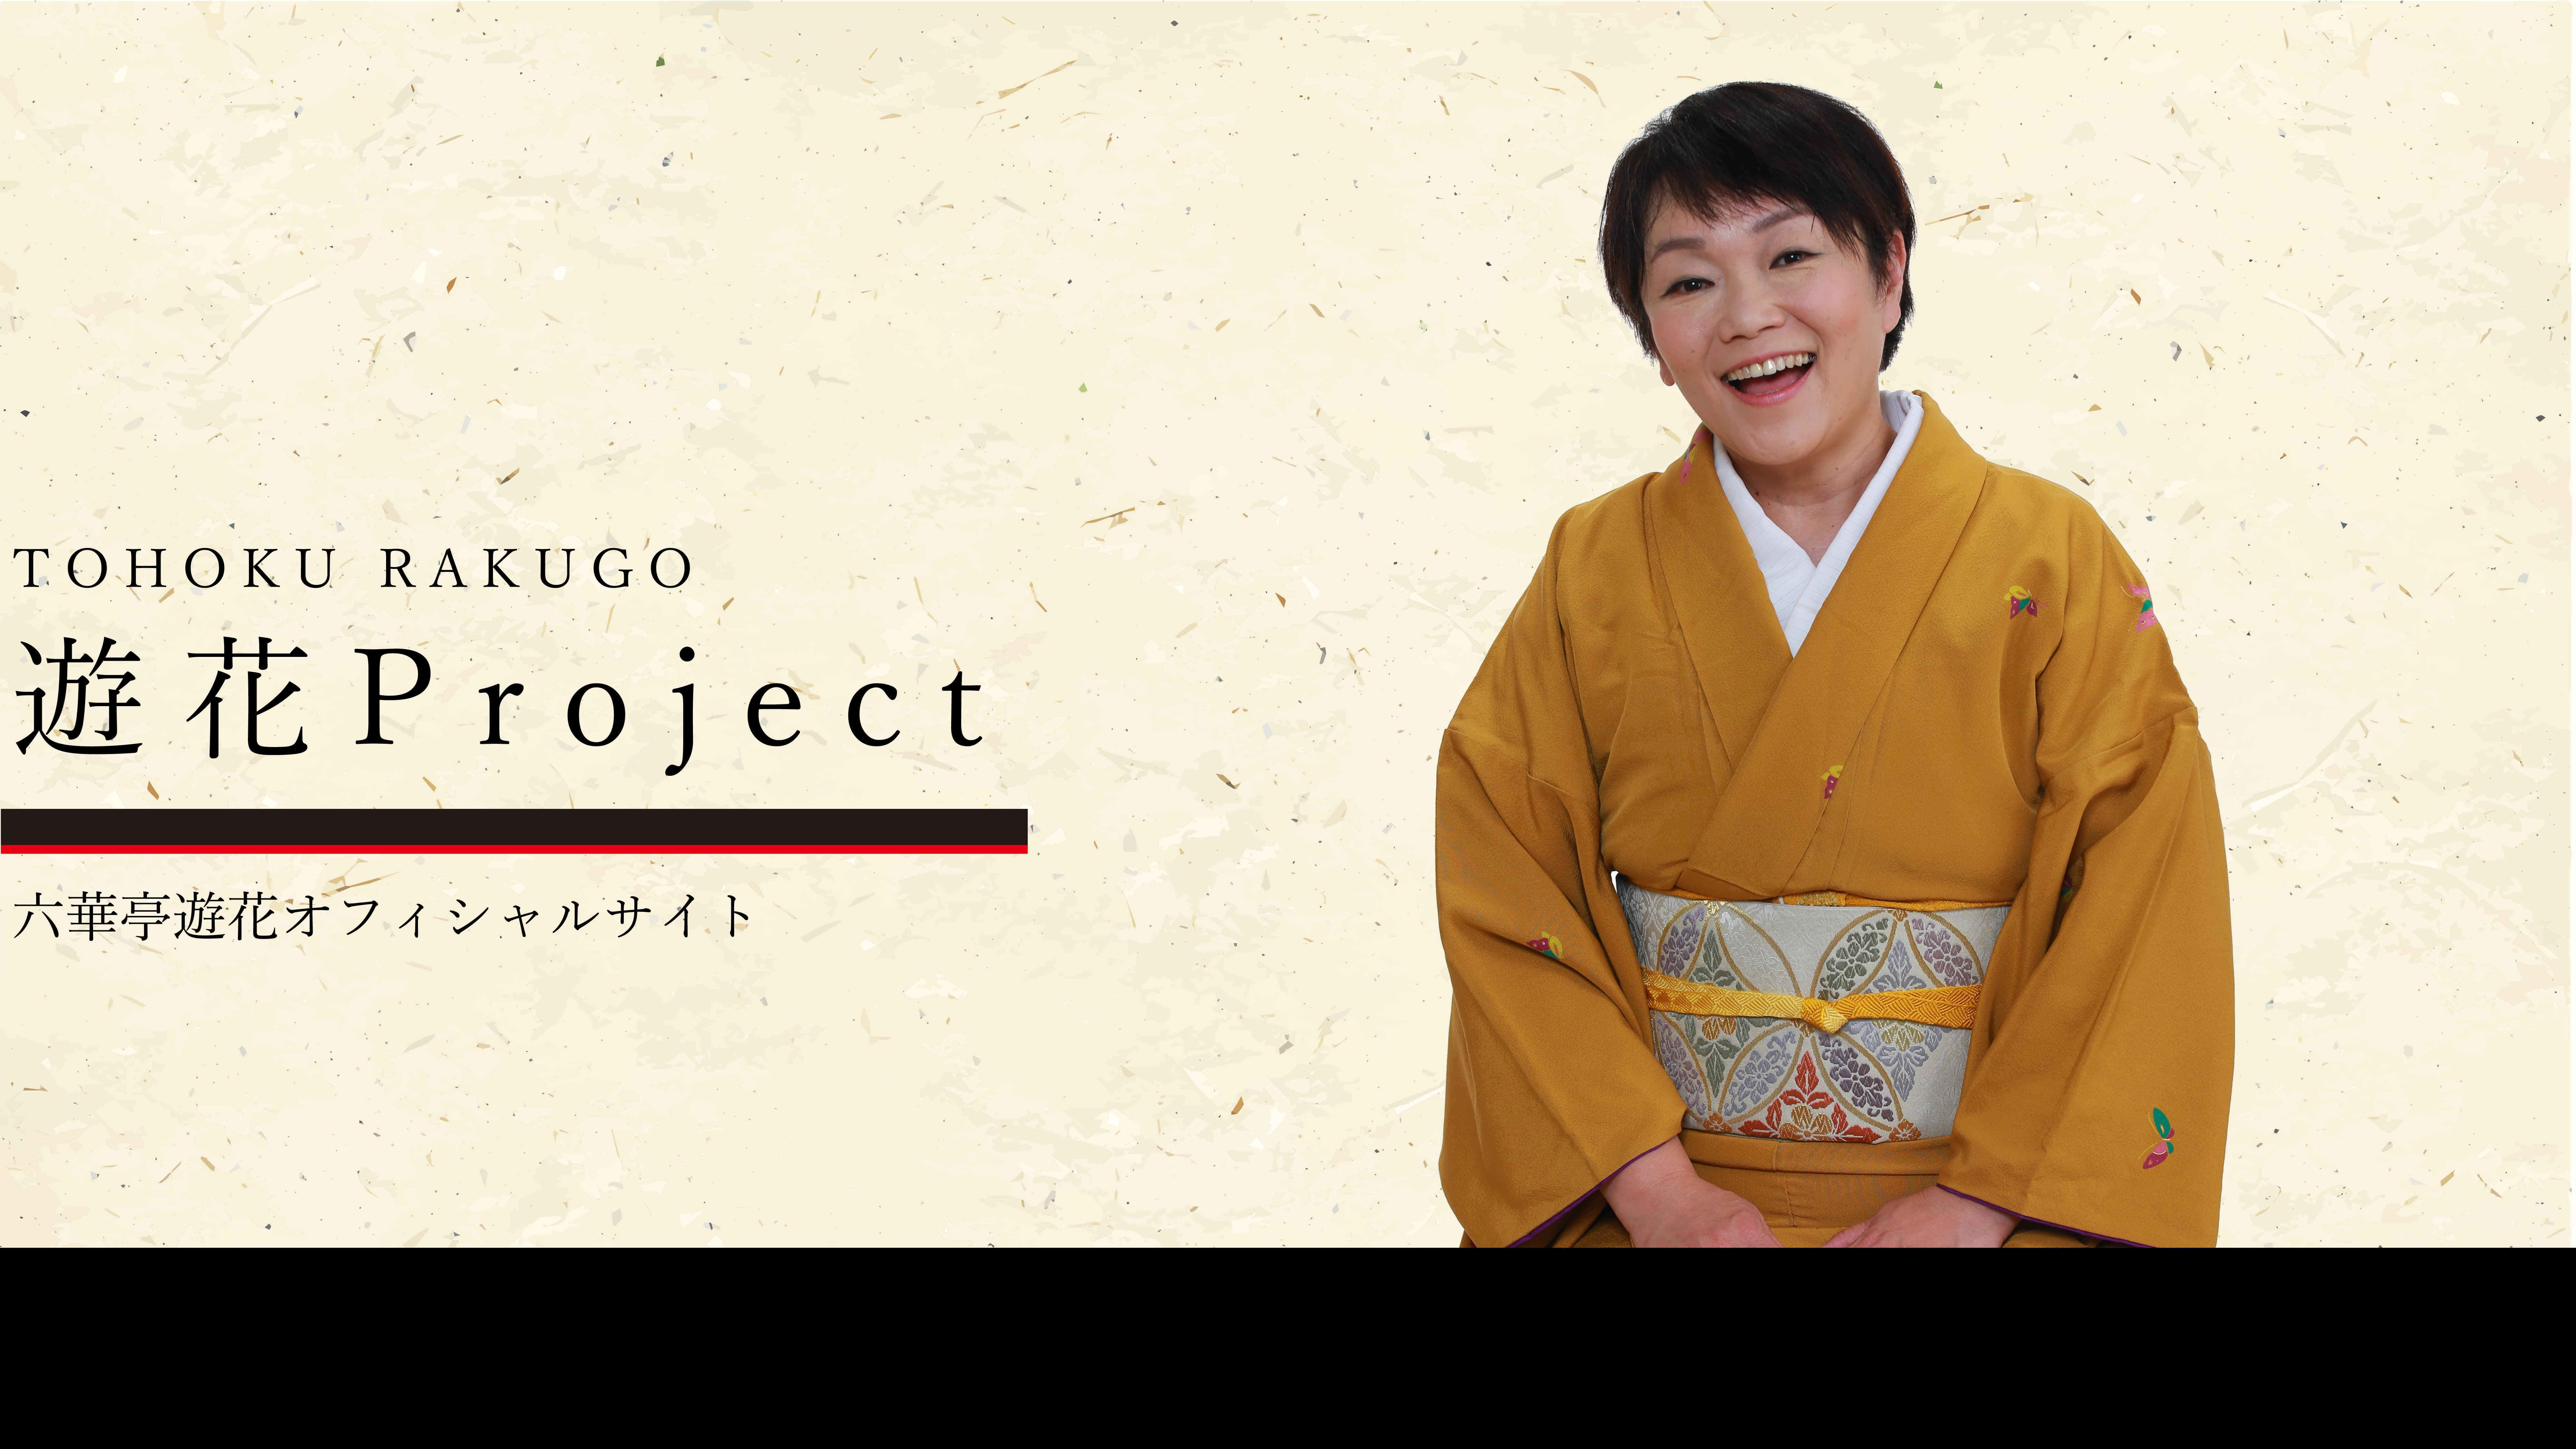 Yuka project_main3 1920x1080_アートボード 1-mi